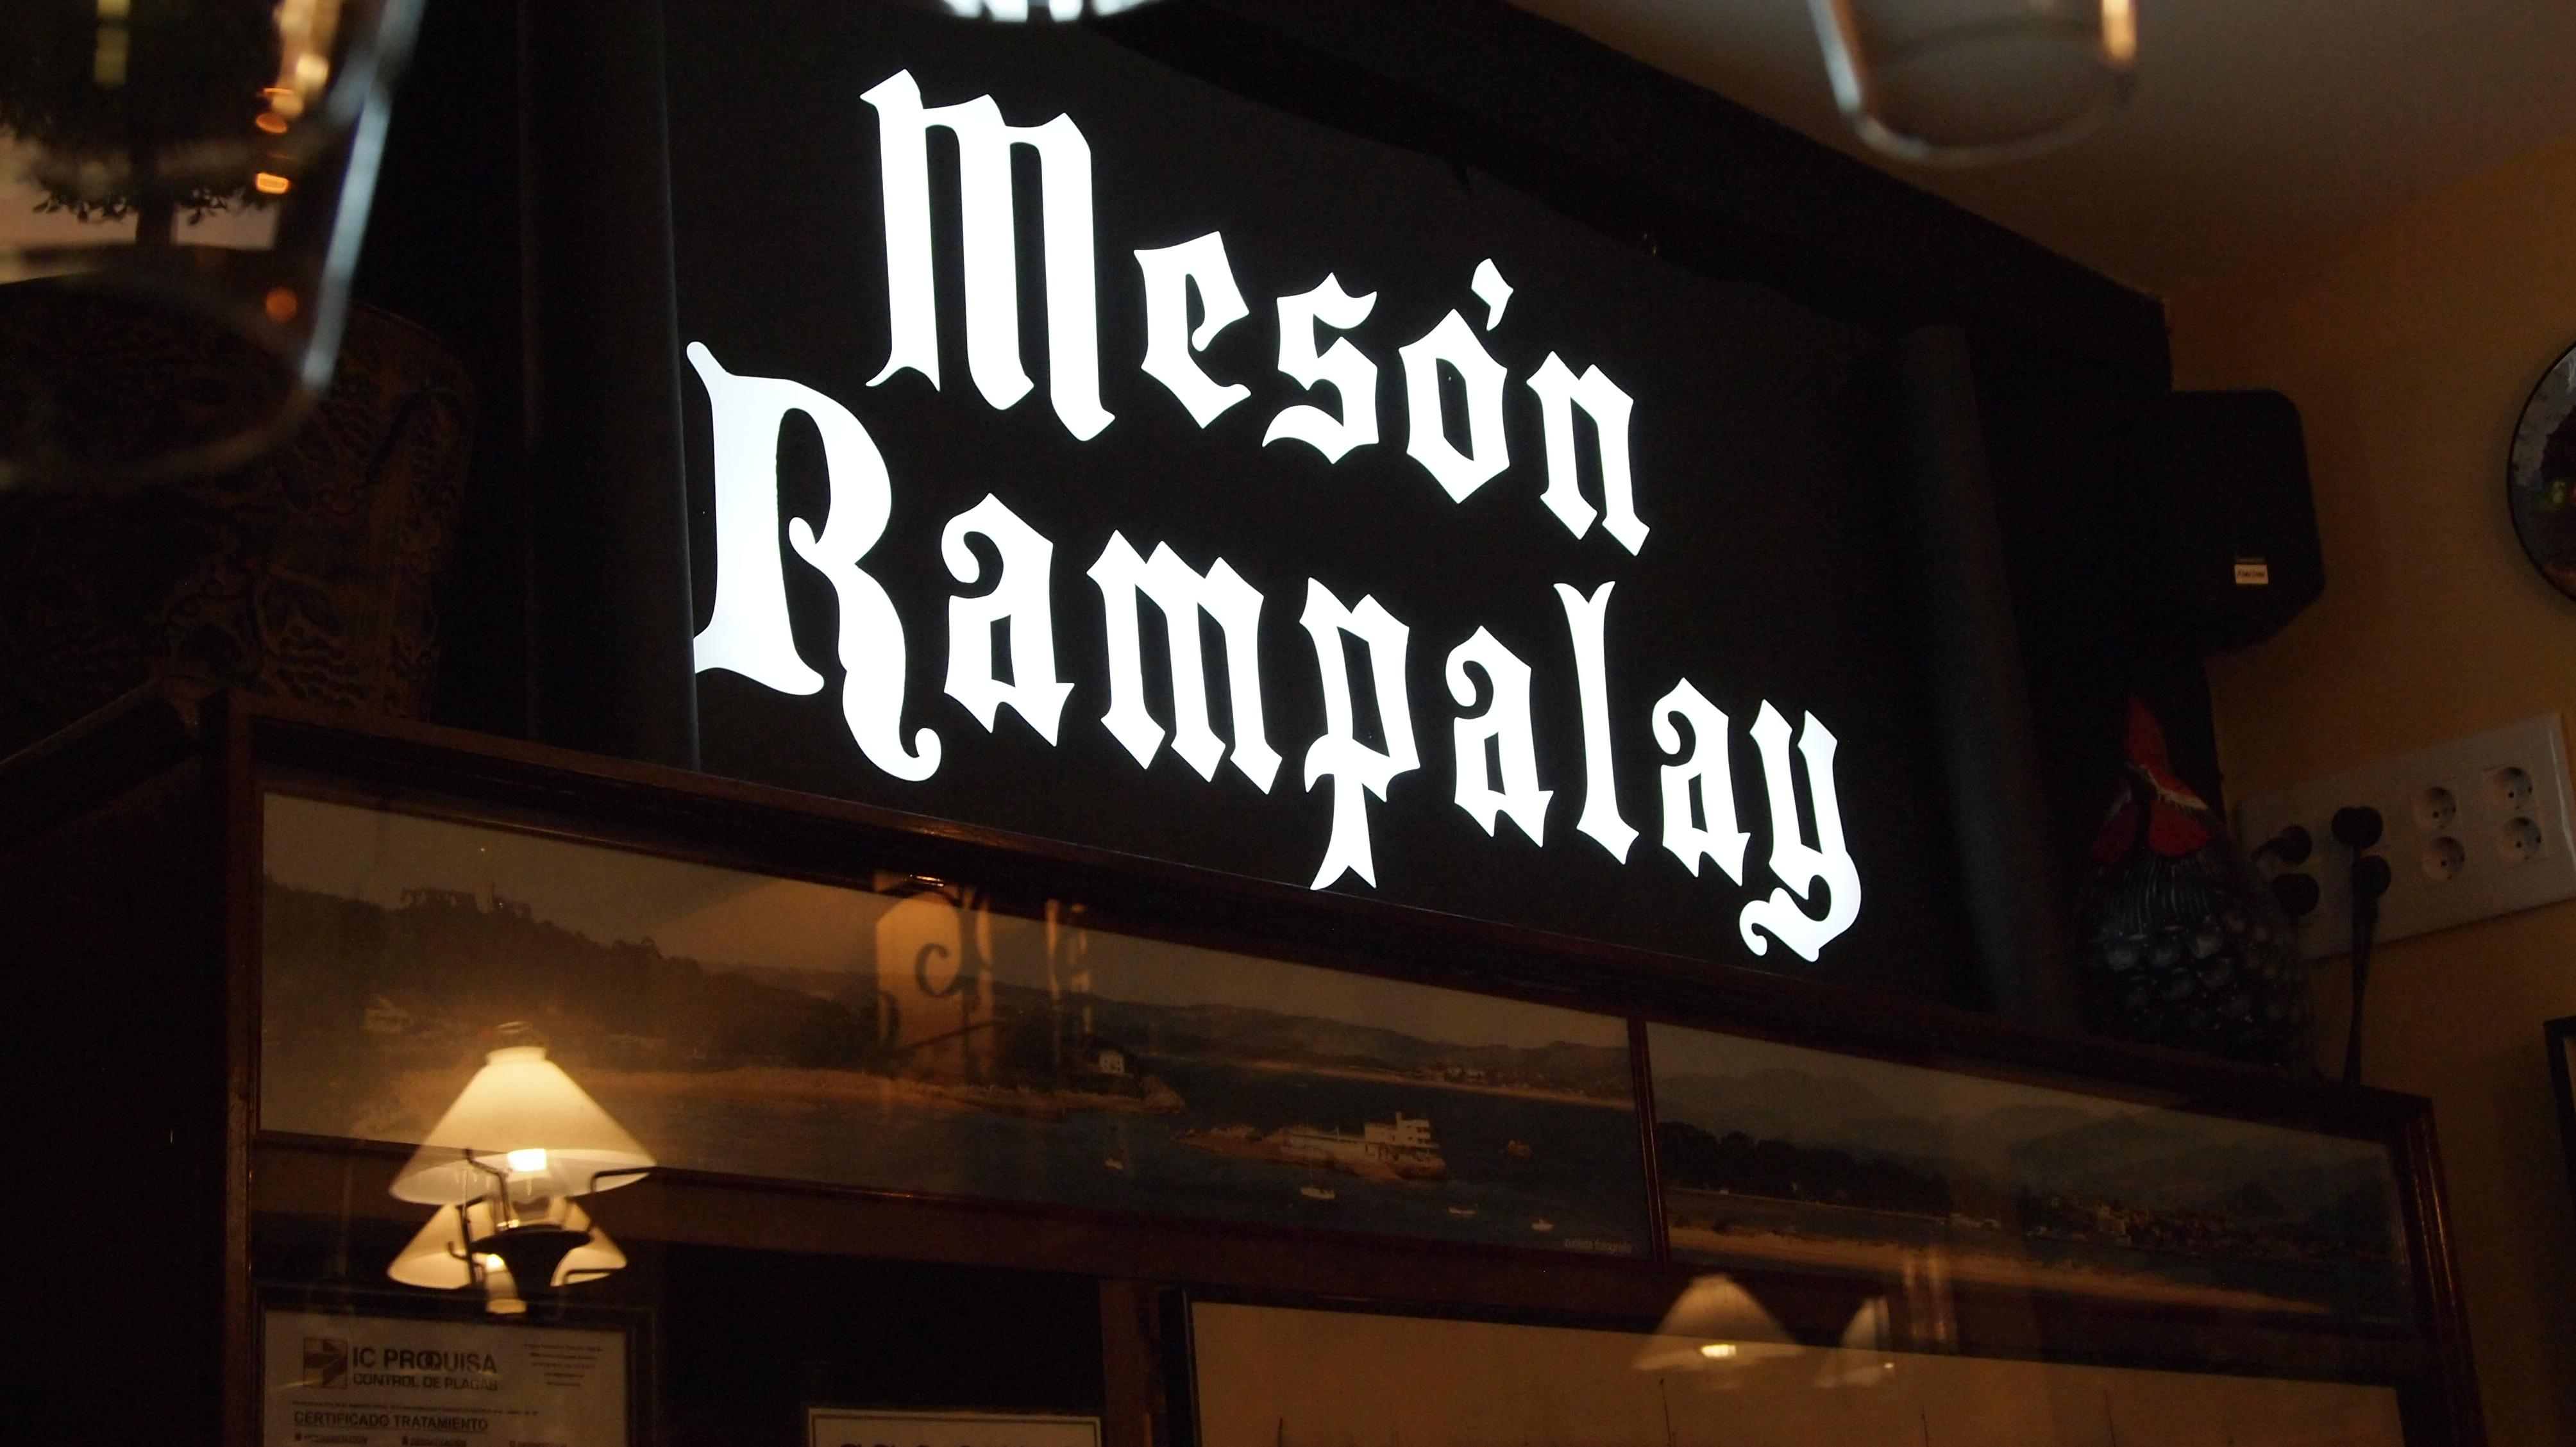 Mesón Rampalay Santander